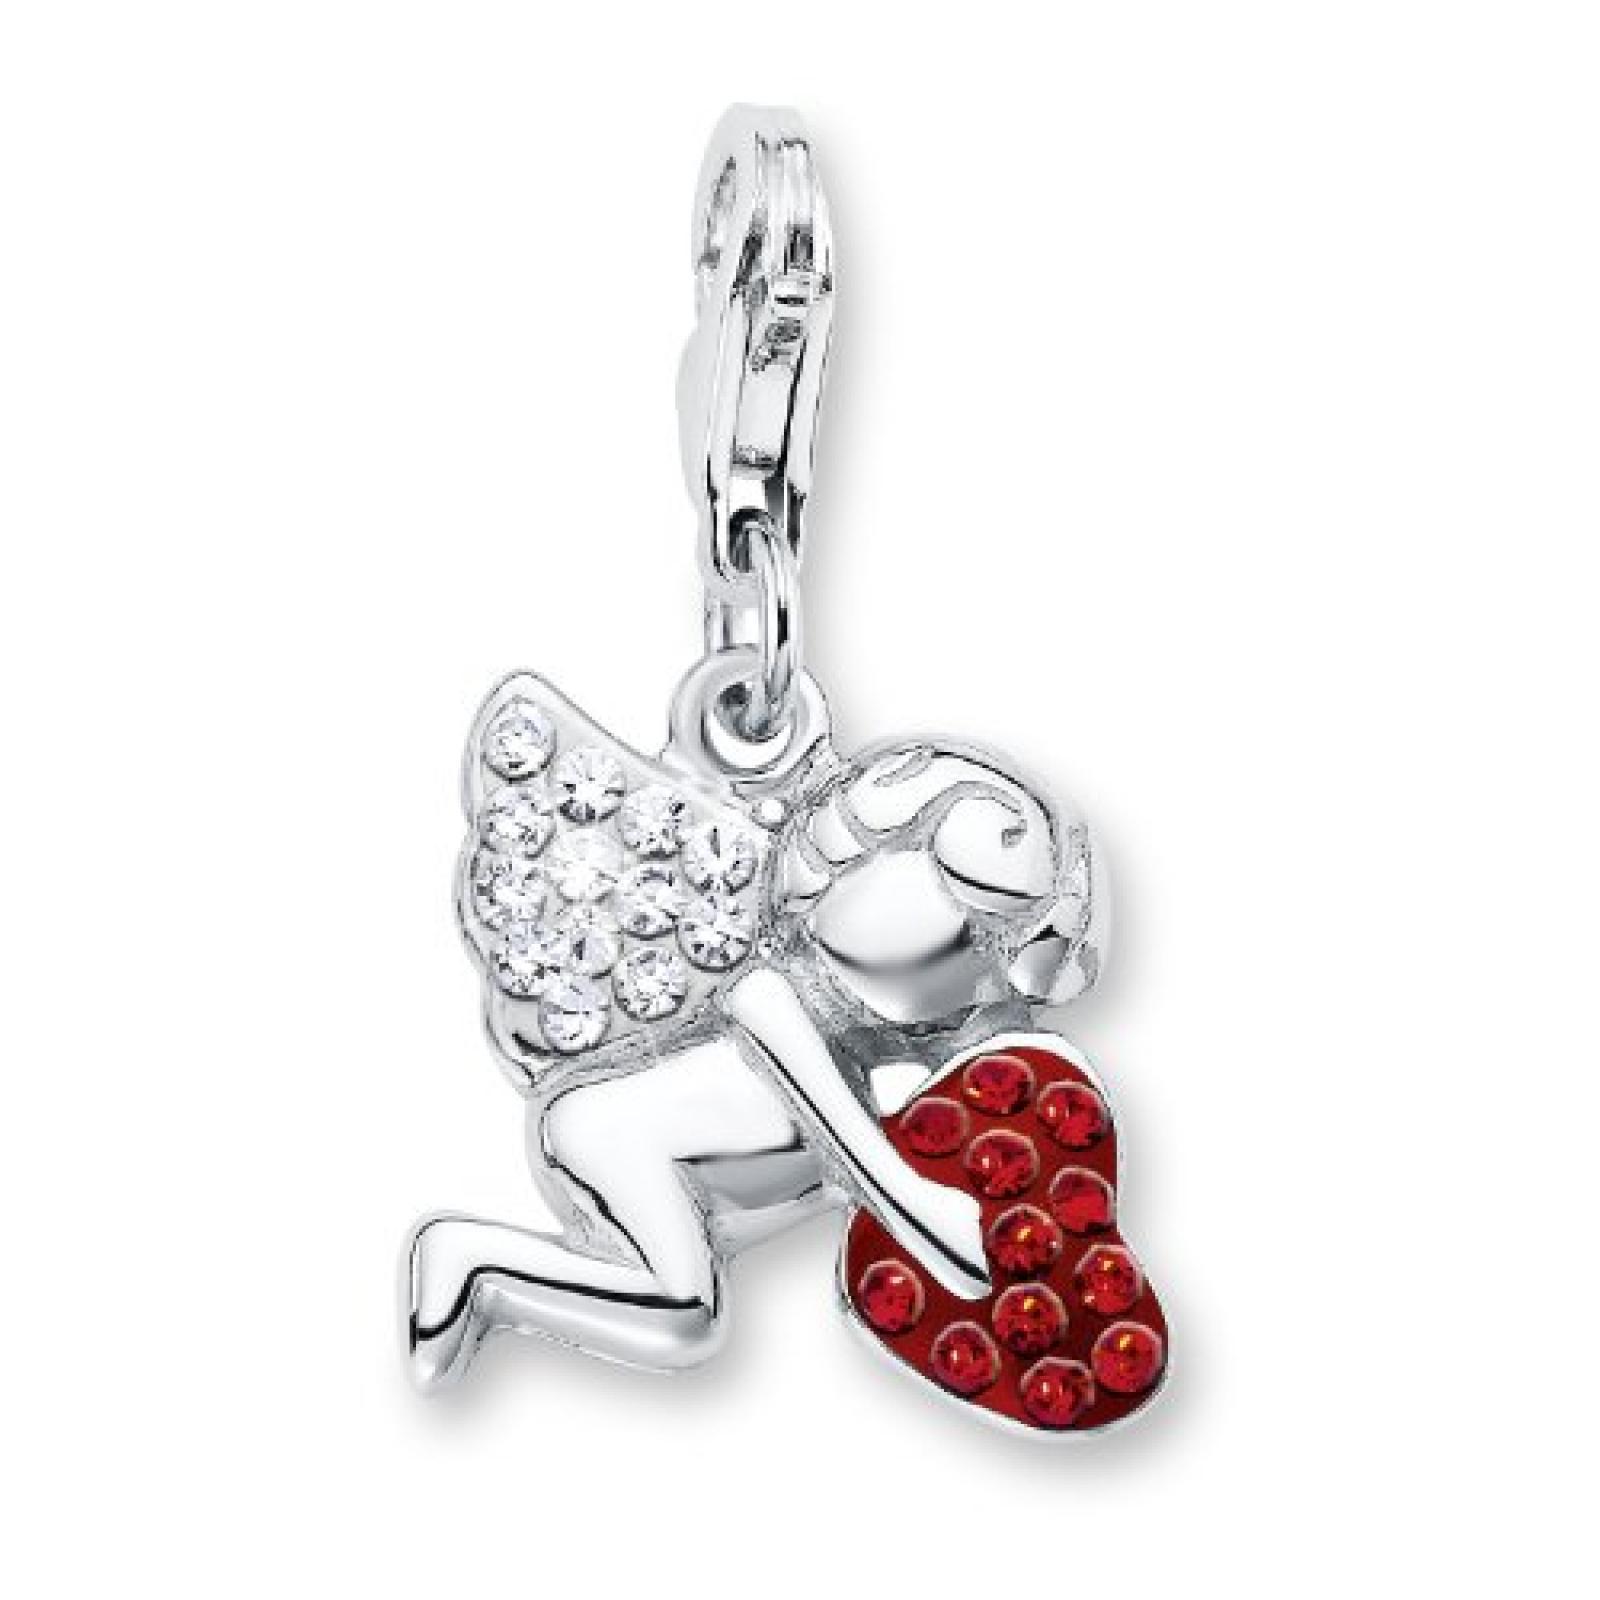 Amor Jewelry Damen-Charm Engel mit Herz 925 Sterling Silber 415484